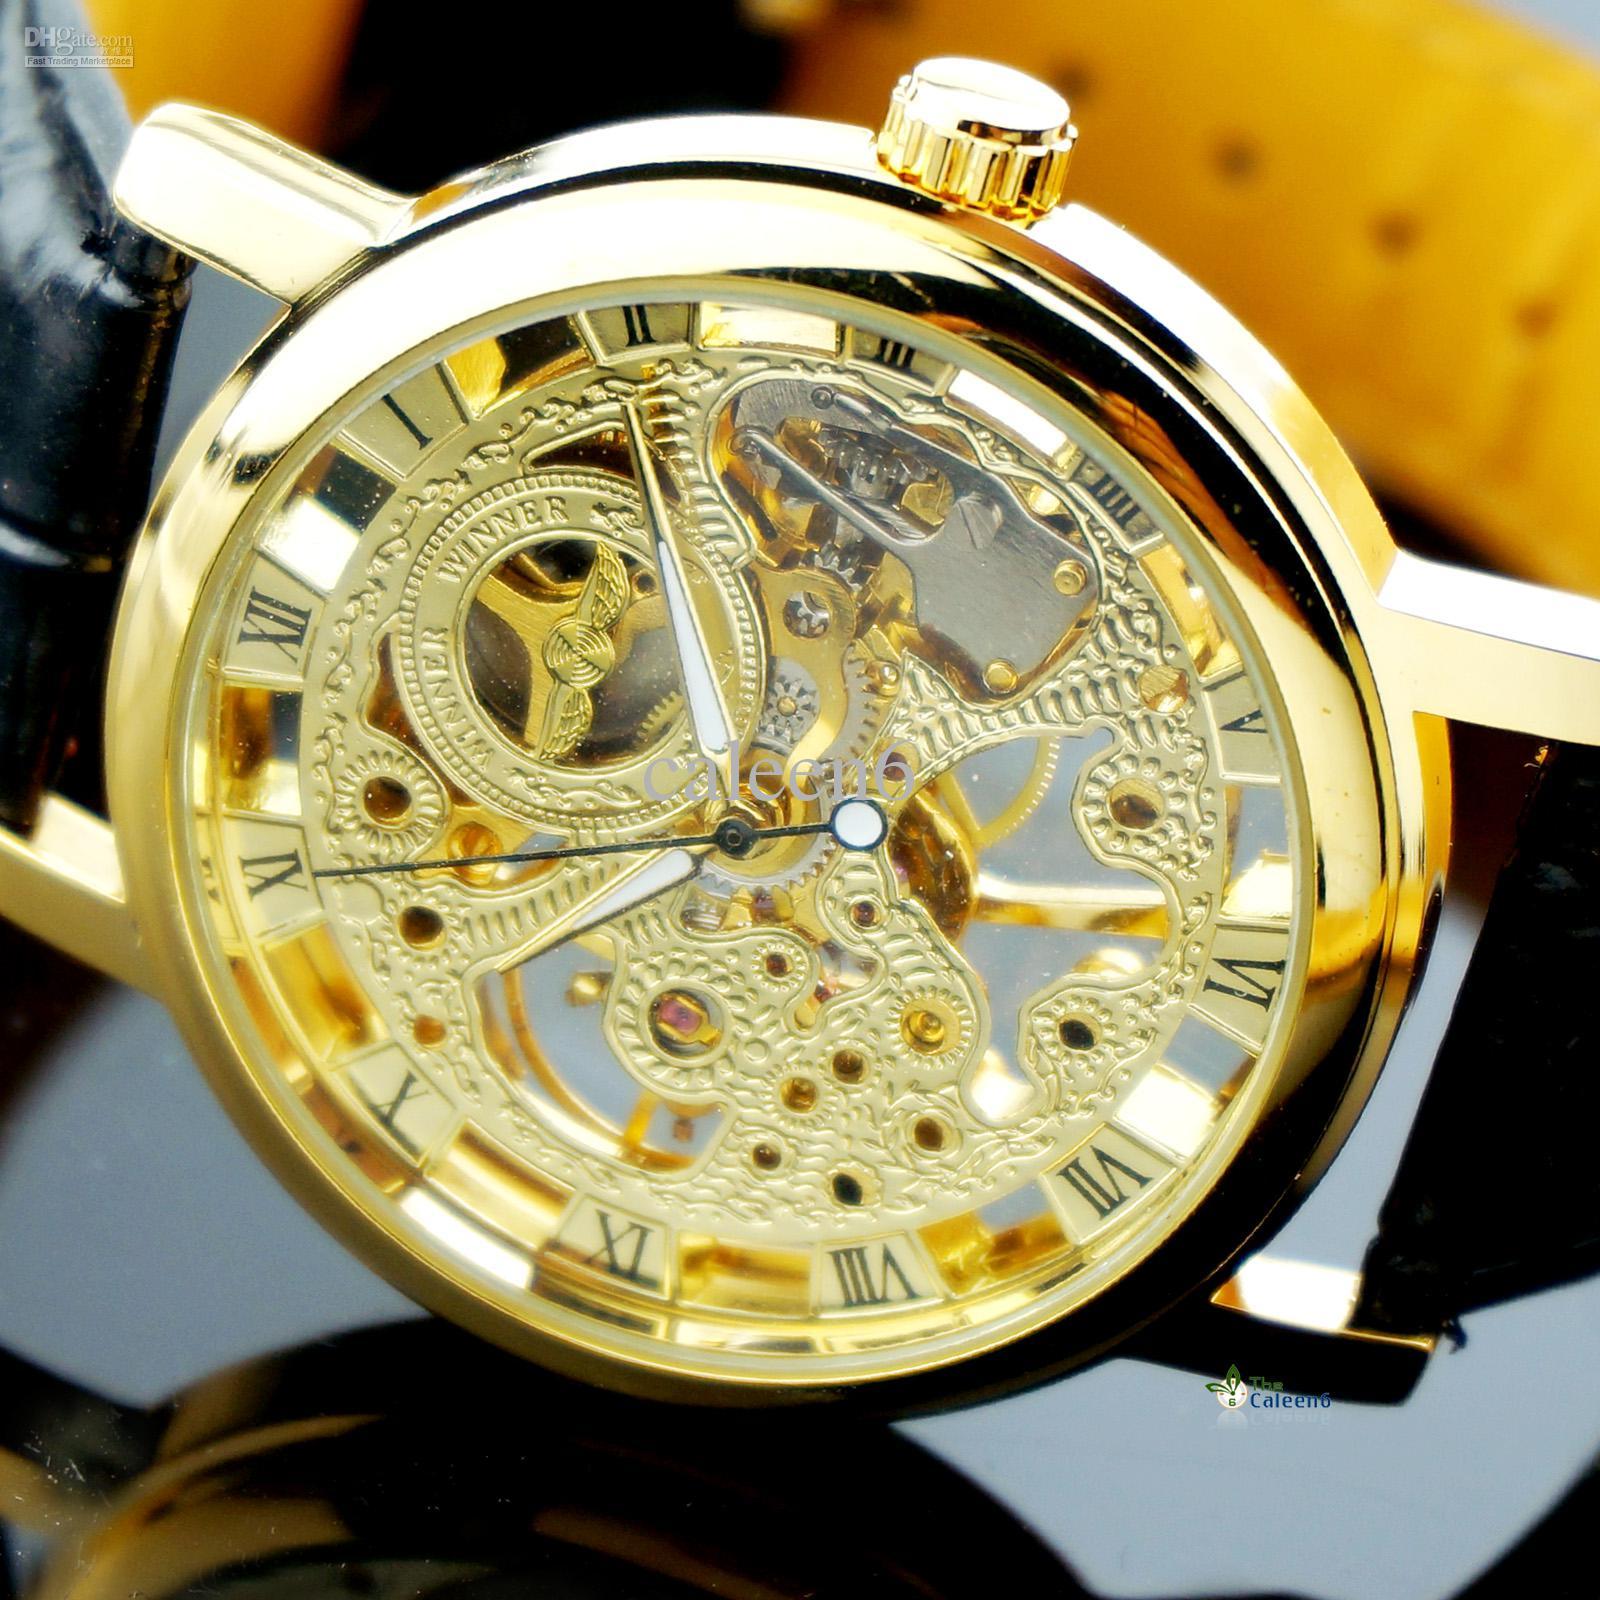 fasion luxury skeleton watch mechanical watches men s watches gold fasion luxury skeleton watch mechanical watches men s watches gold silver leather men watch shipping